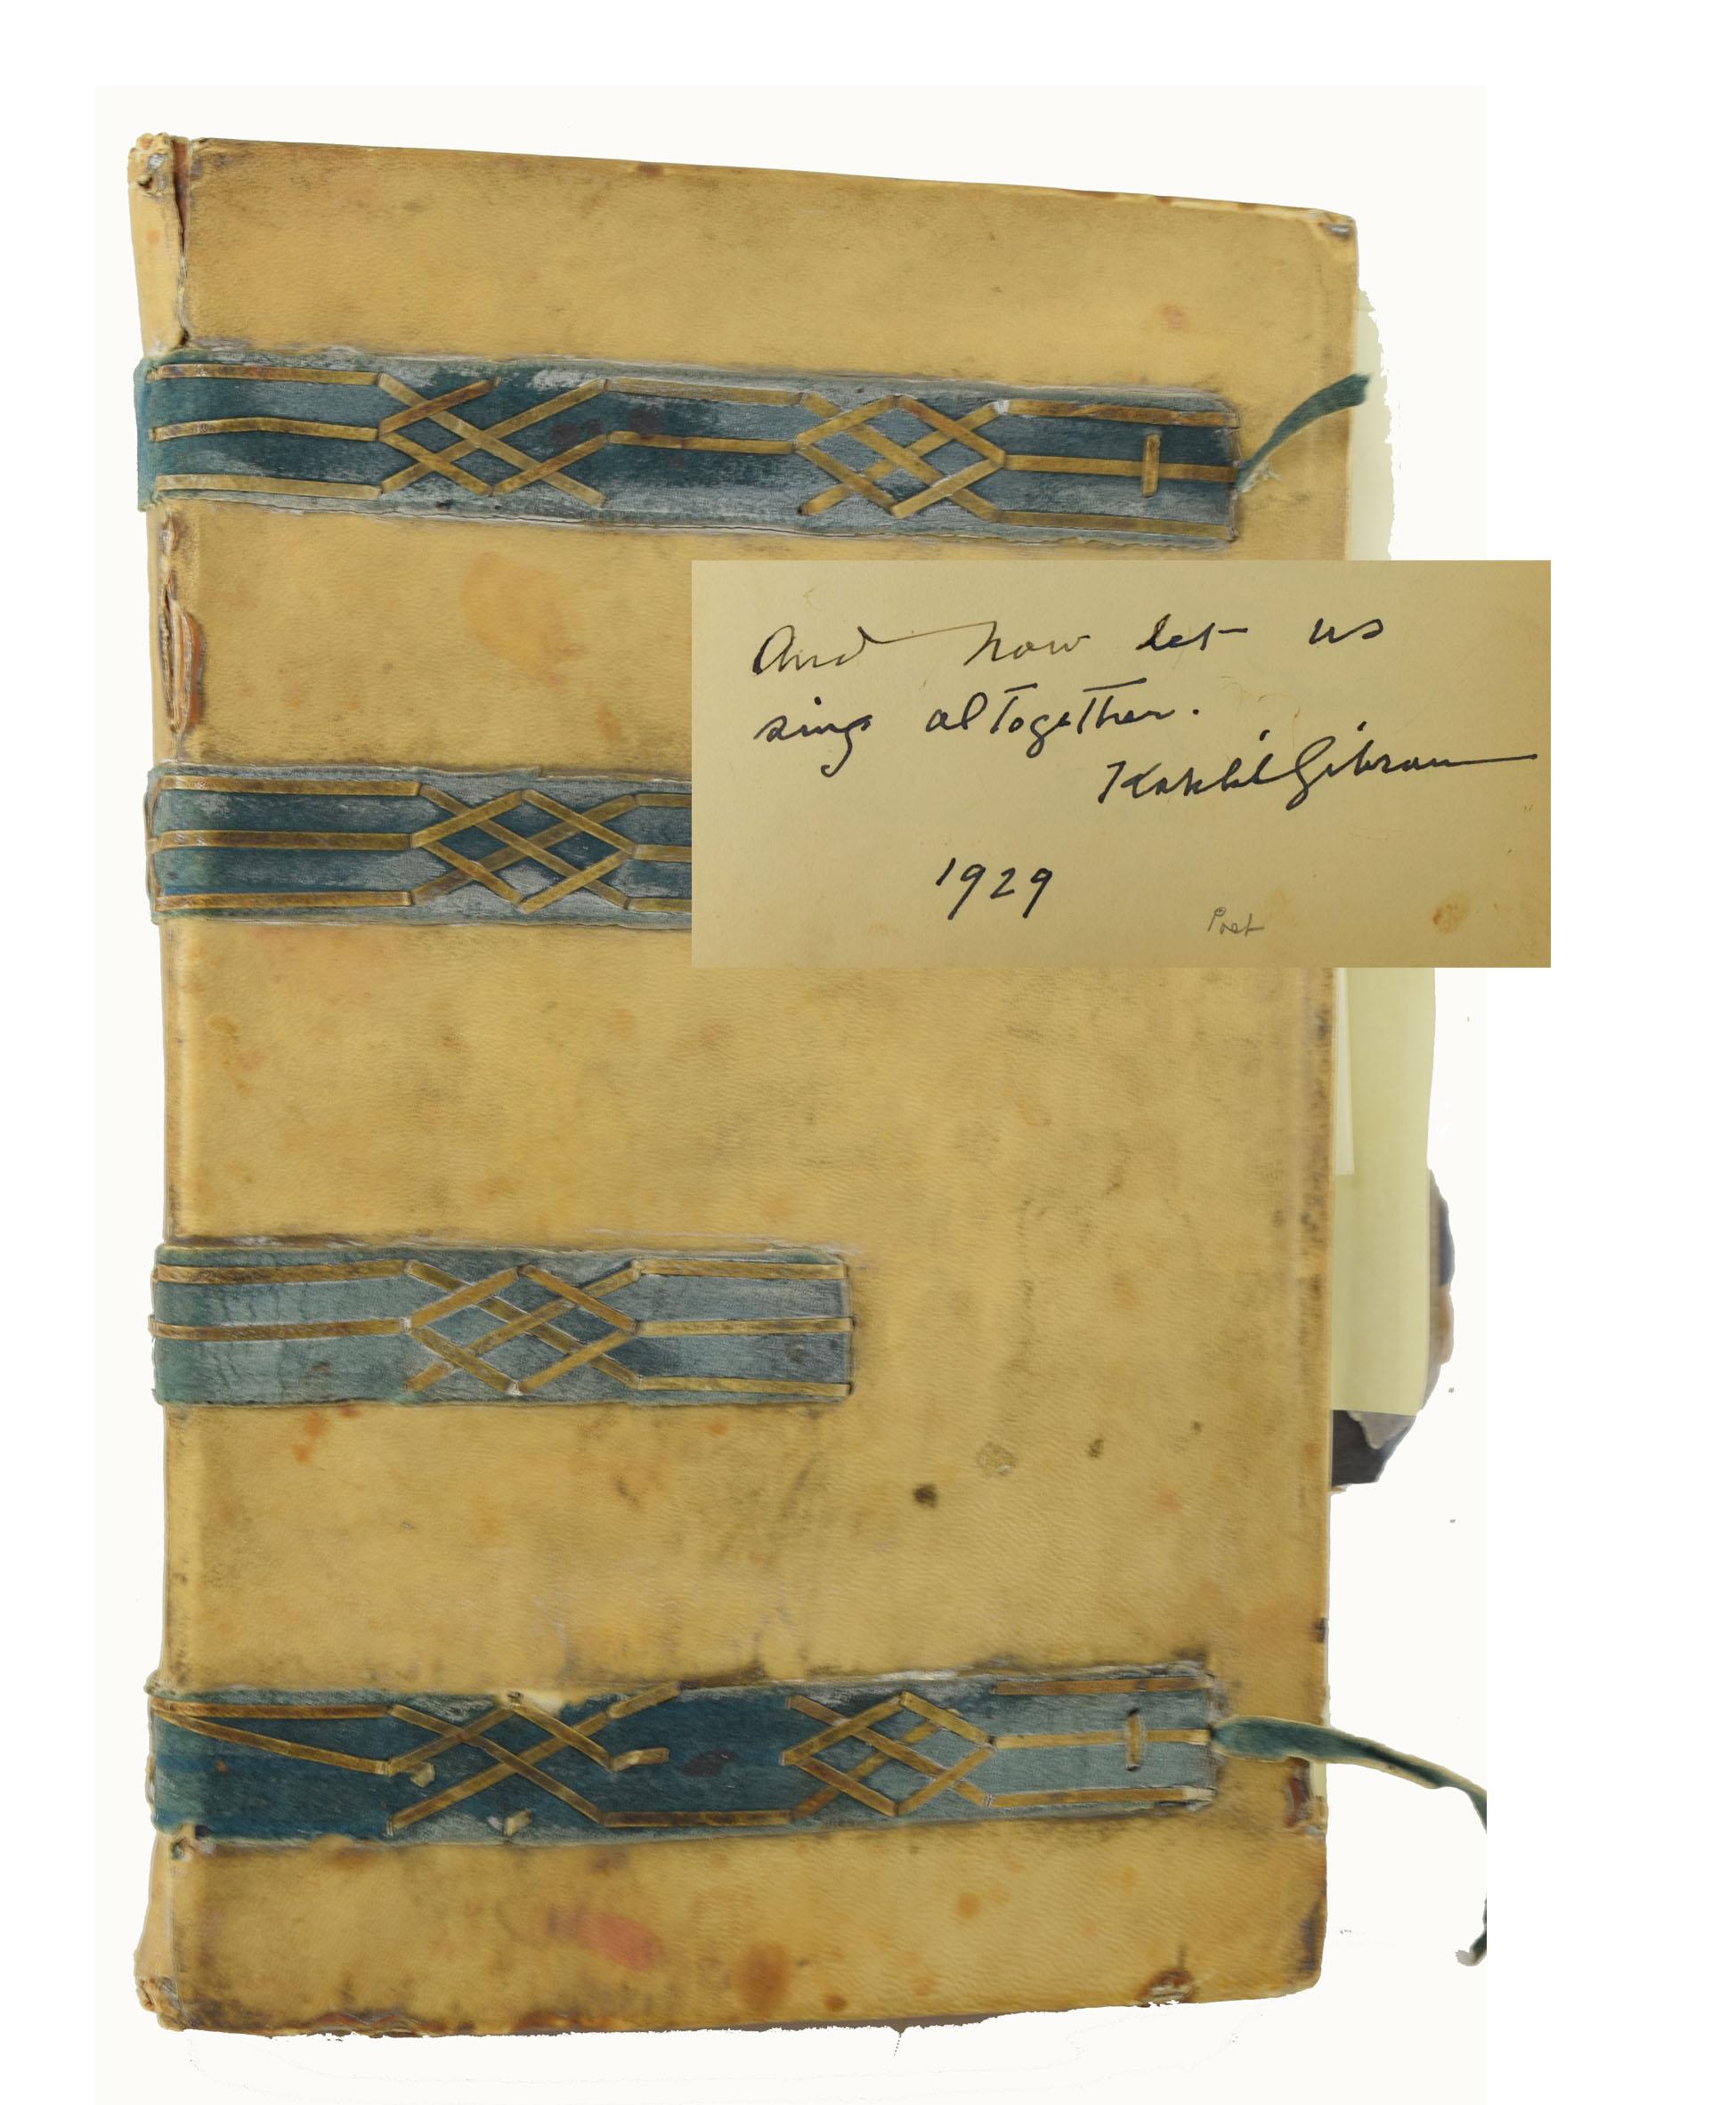 K. Gibran, Unpublished Handwritten Fragment, Signed Autograph Album, 1929.